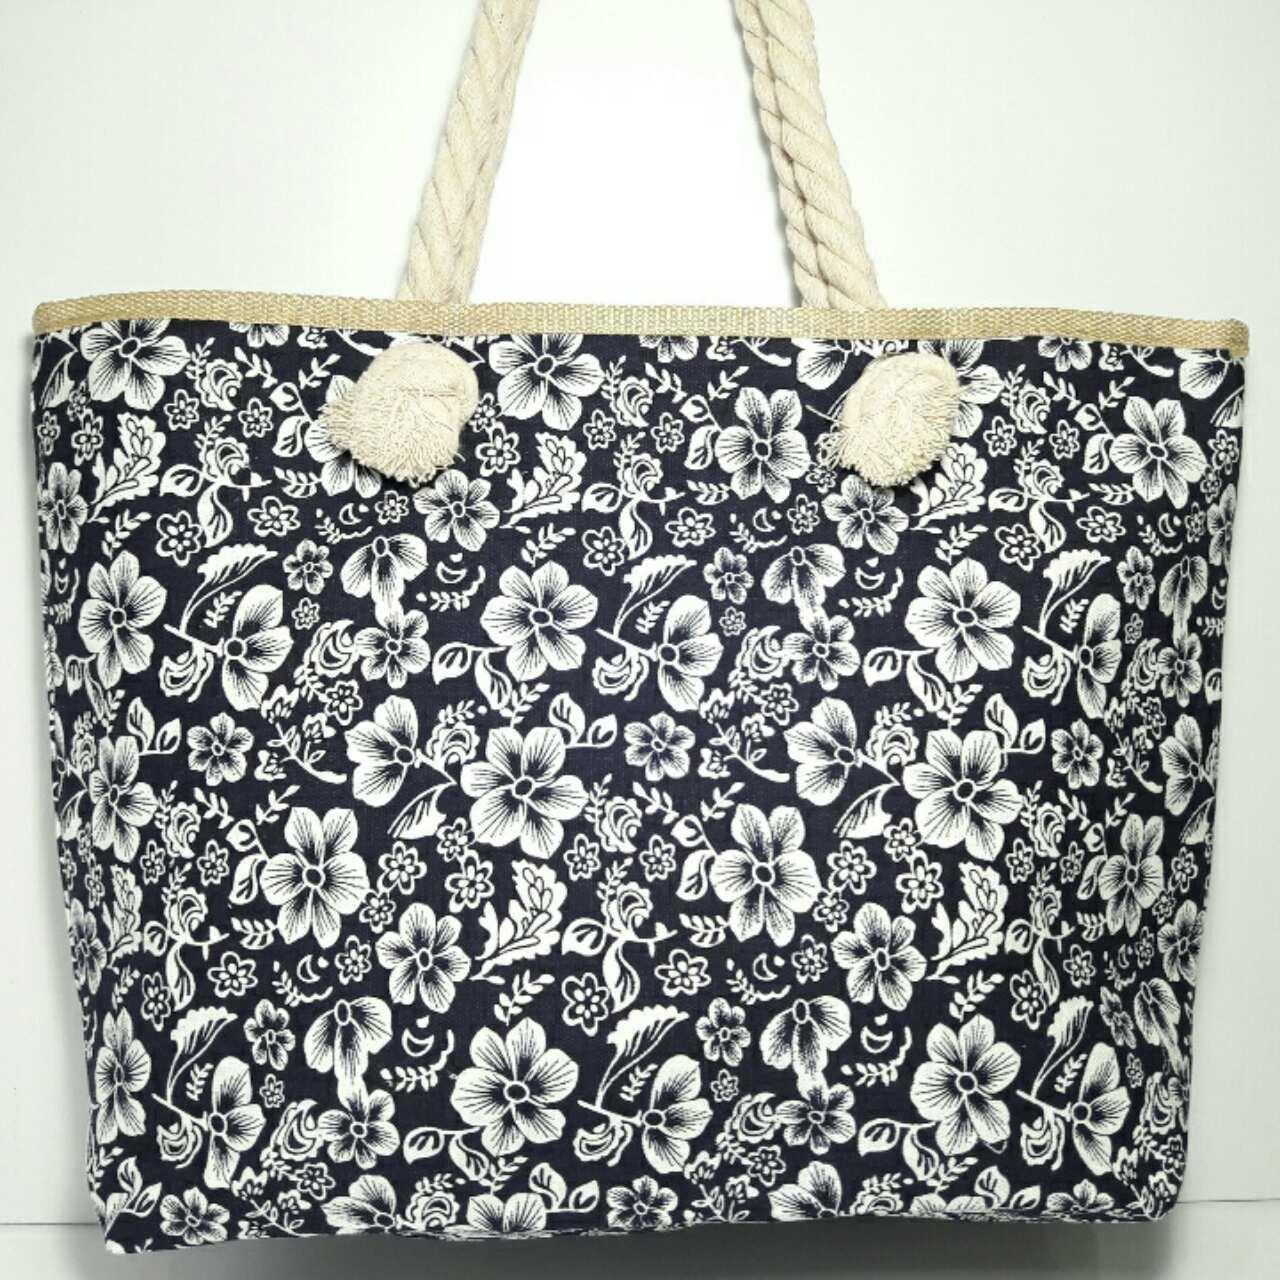 Пляжная сумка текстильная летняя